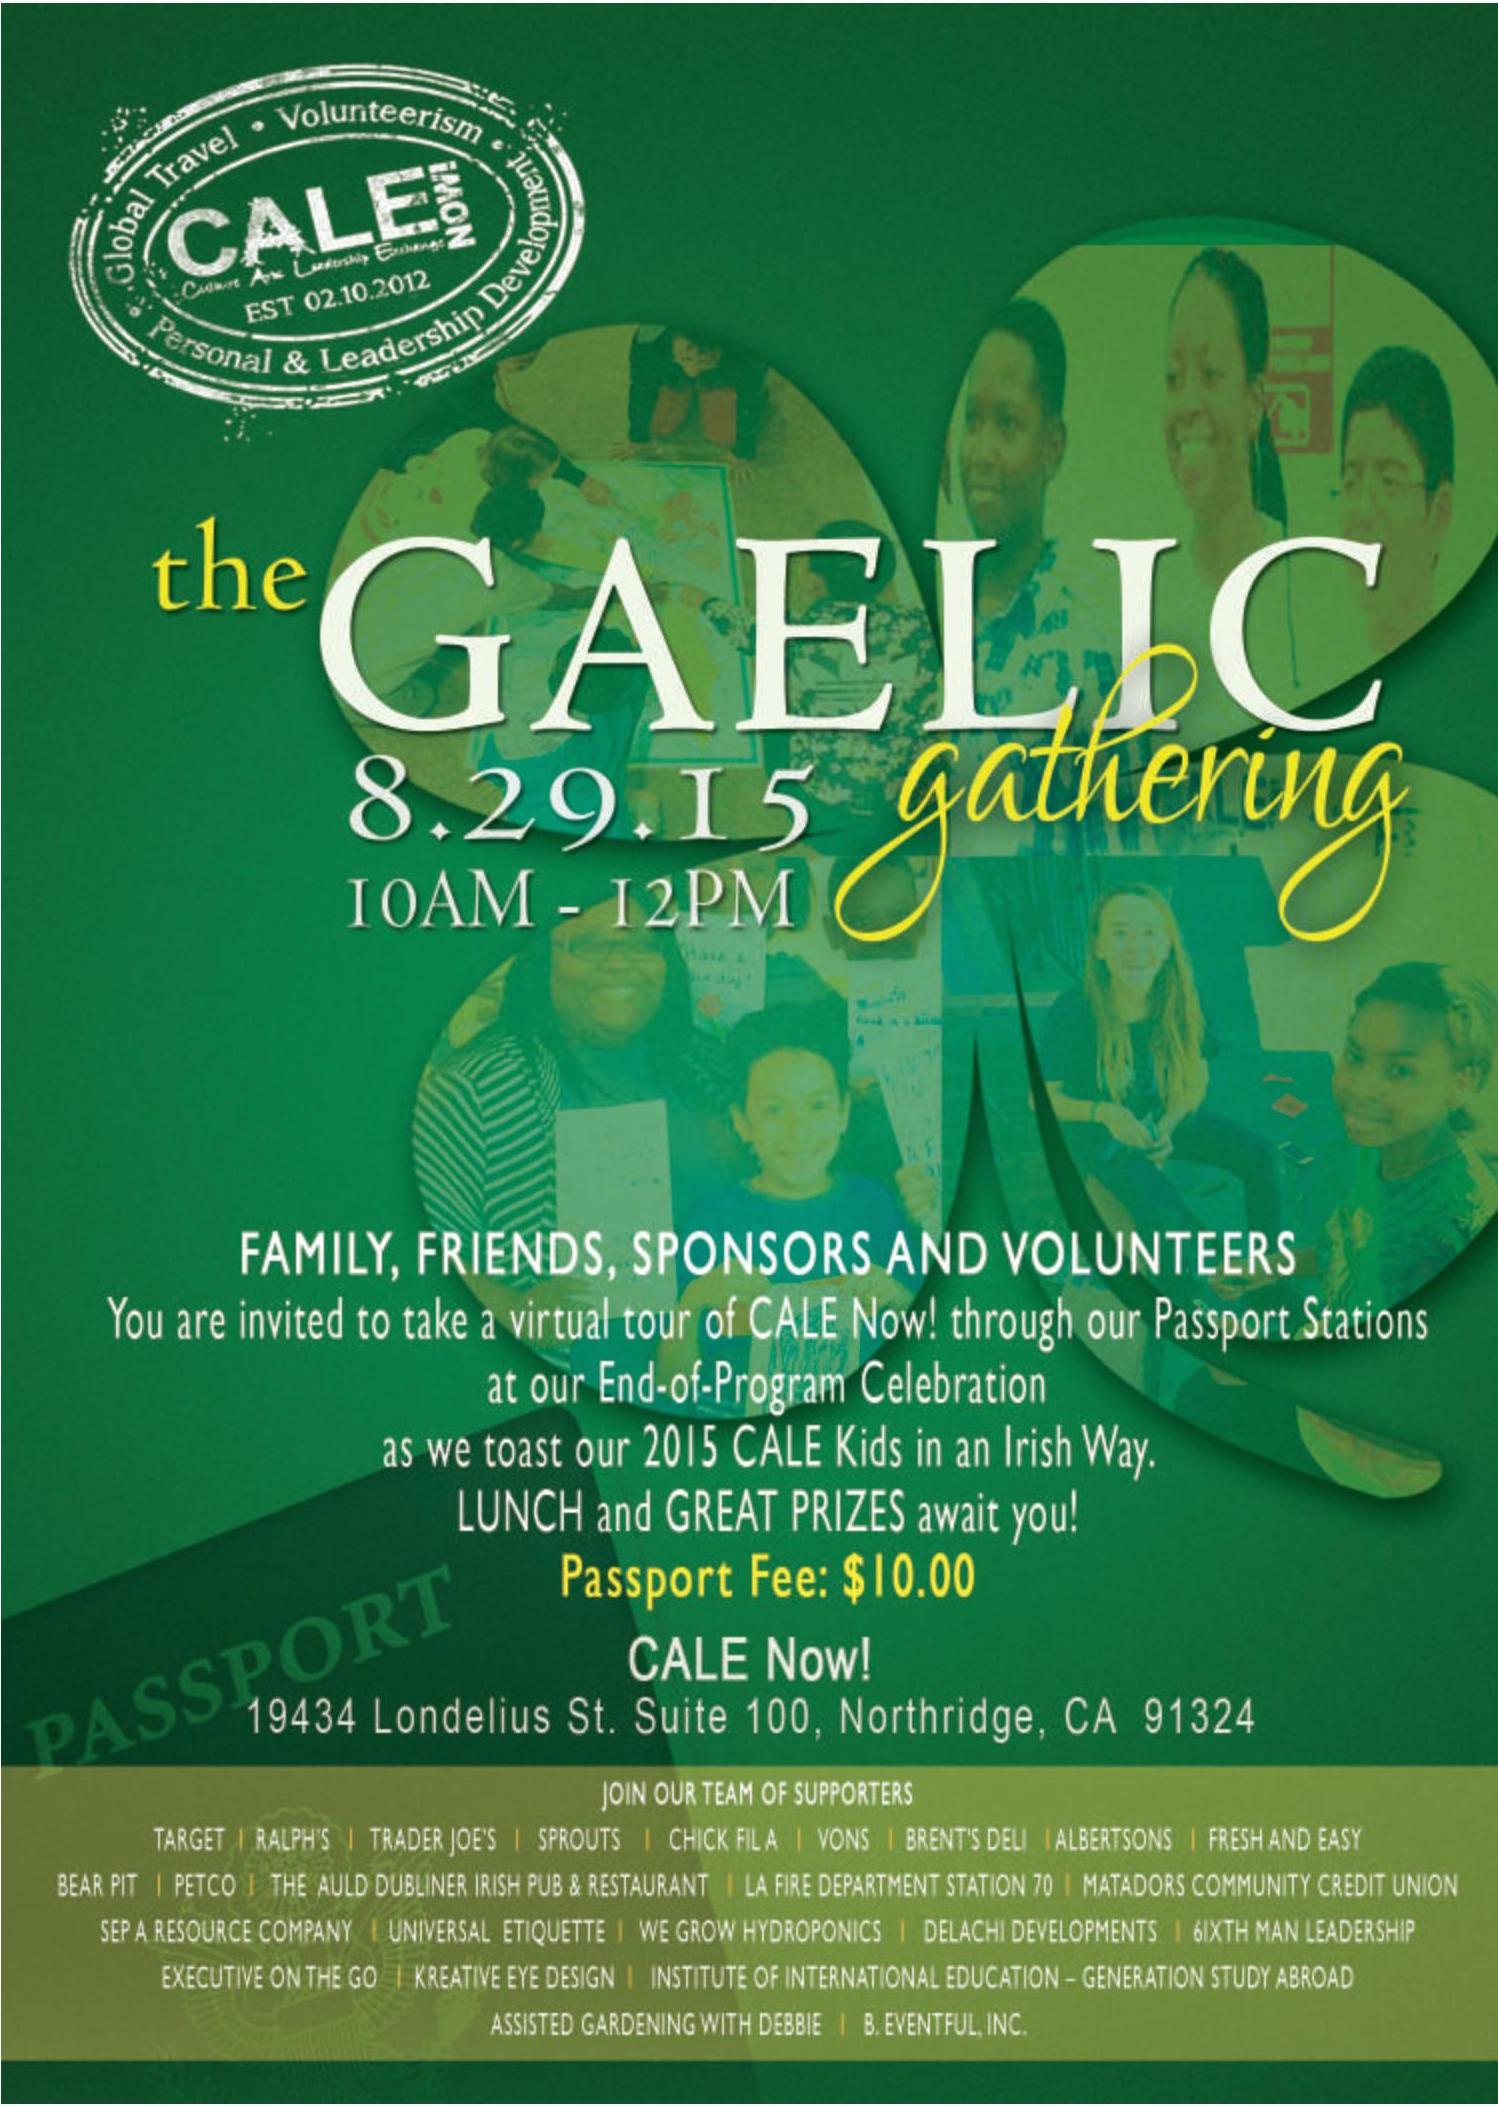 2015 Gaelic Gathering